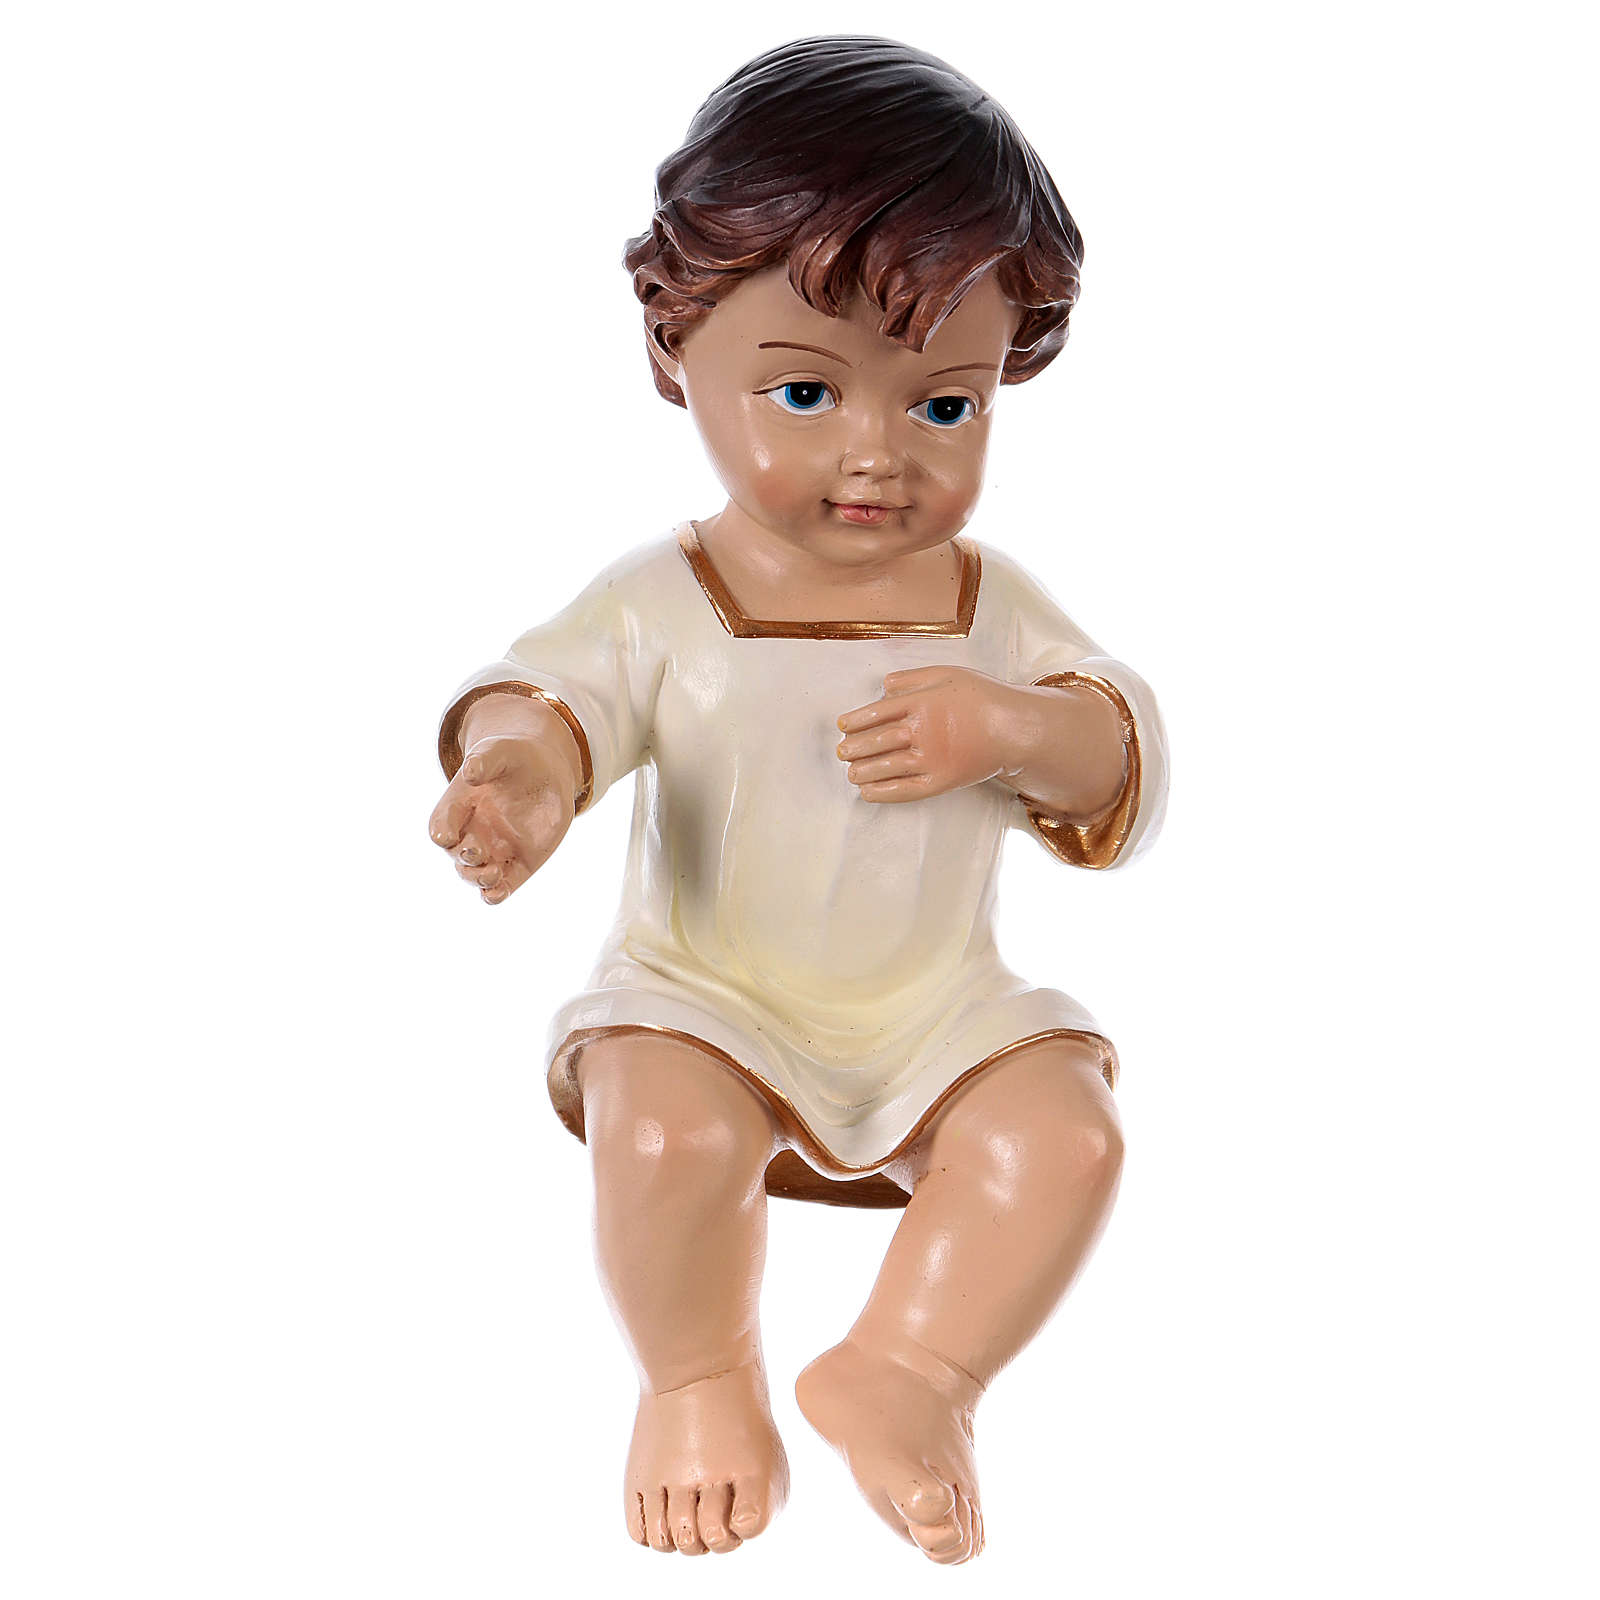 Statue of Baby Jesus 3